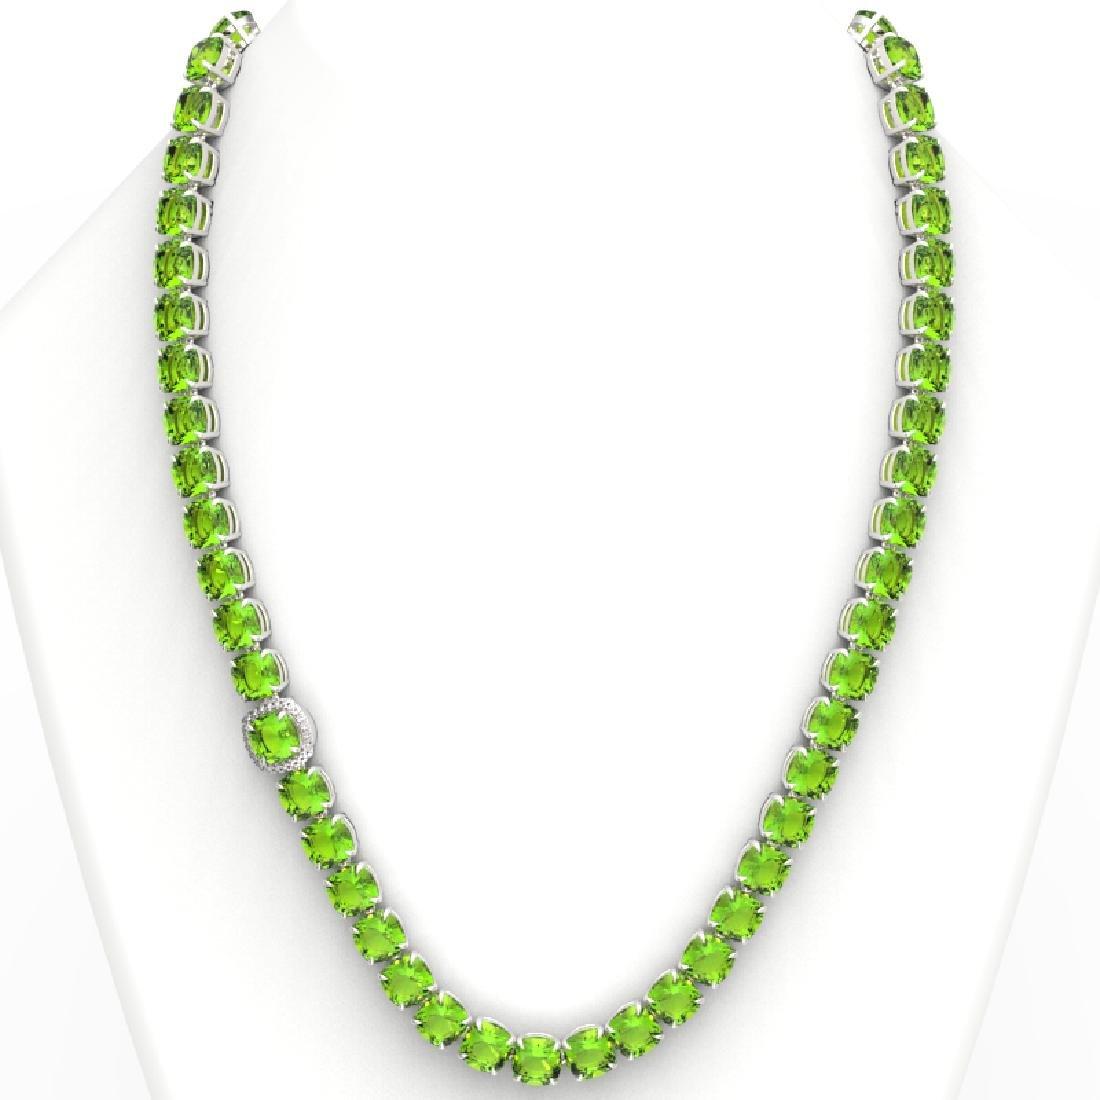 100 CTW Peridot & VS/SI Diamond Pave Necklace 14K White - 3